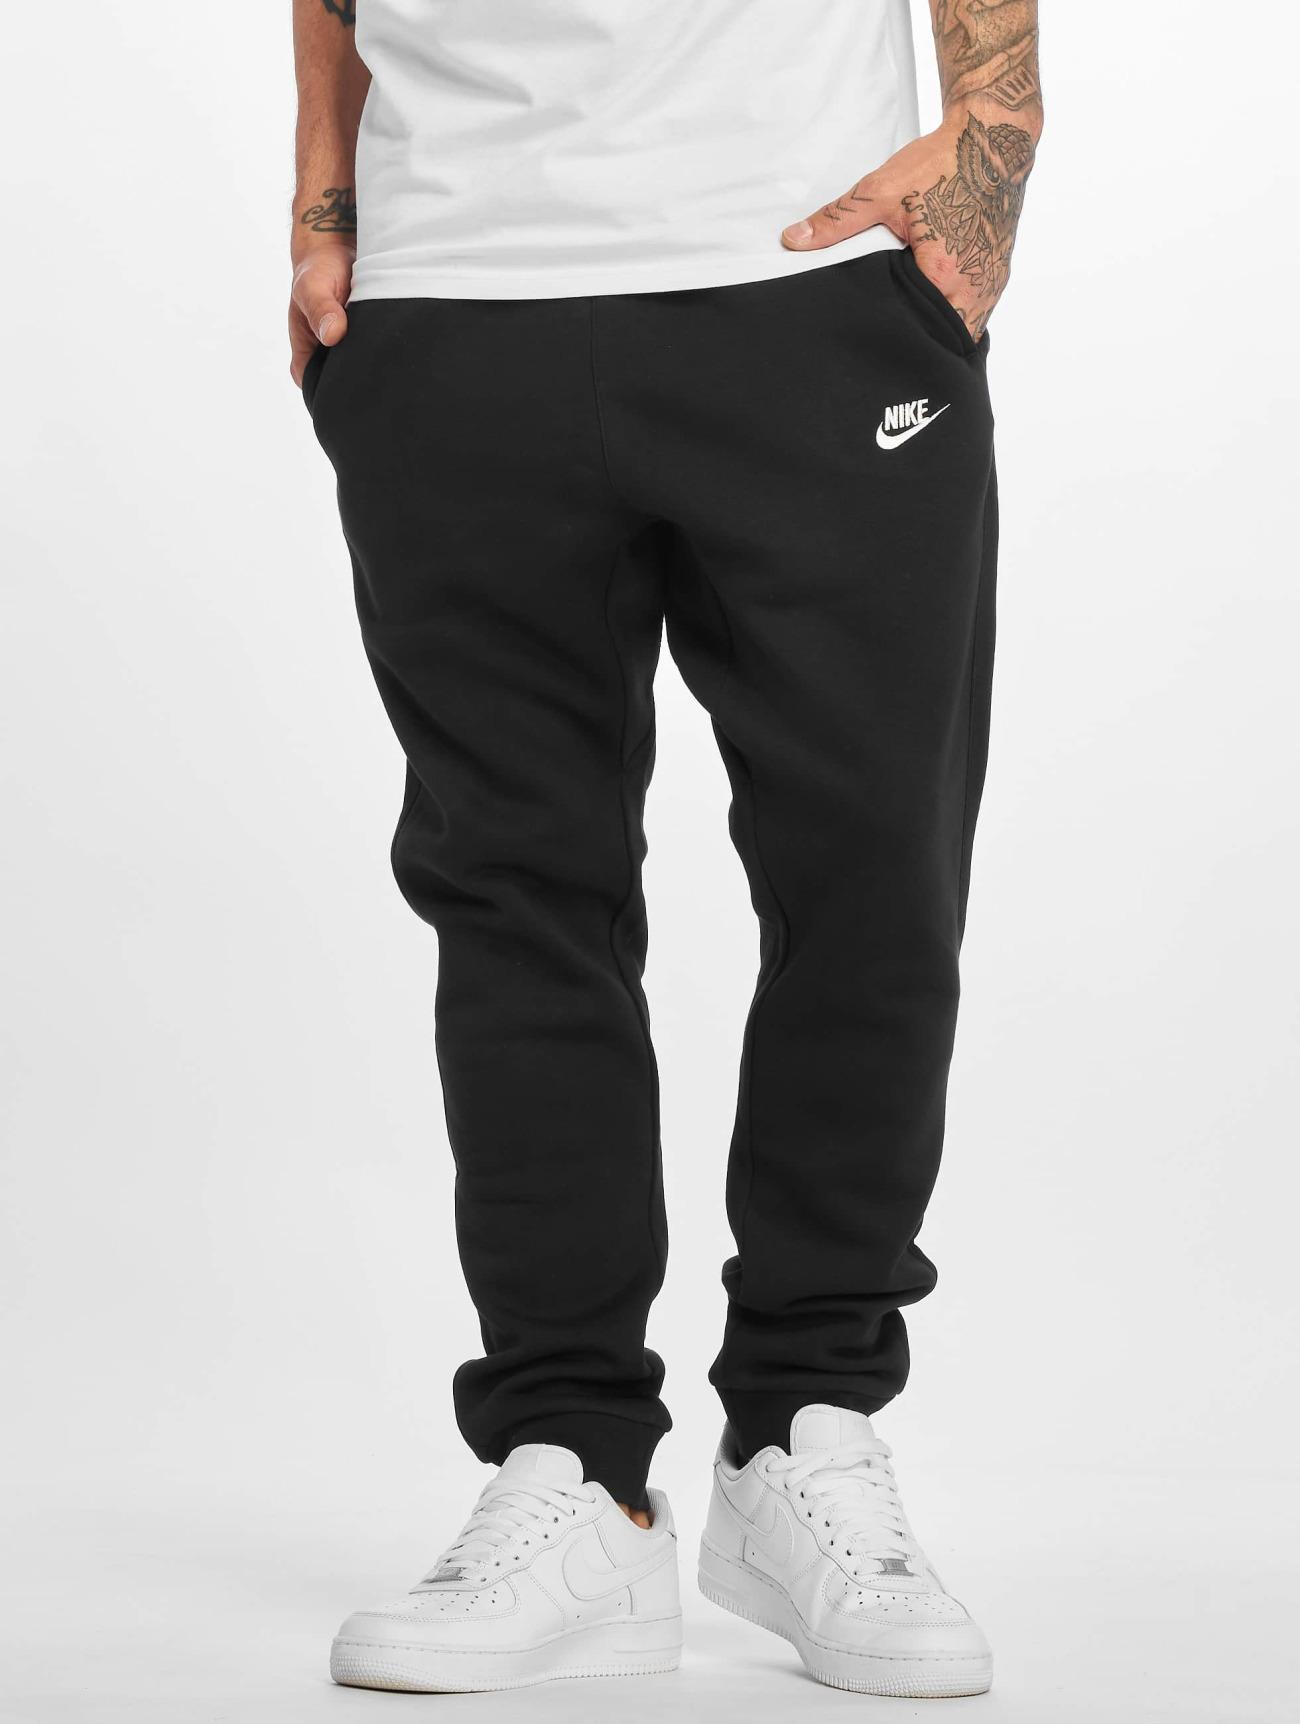 Nike Byxor / Joggingbyxor NSW FLC CLUB i svart 257534 Män Byxor